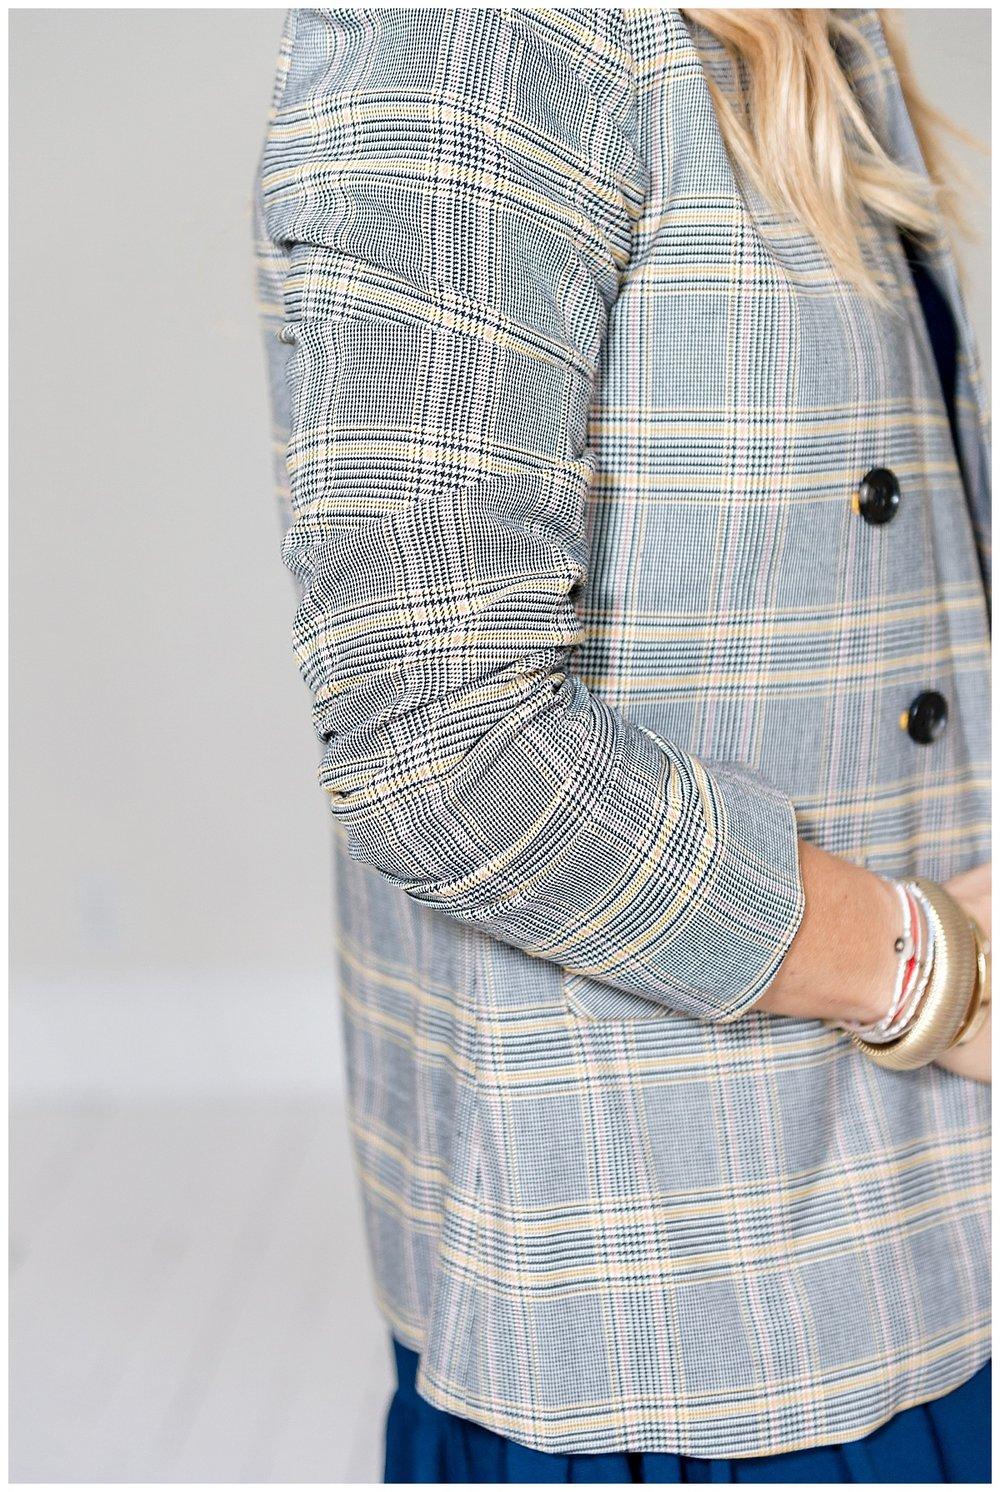 Fall jackets_1361.jpg